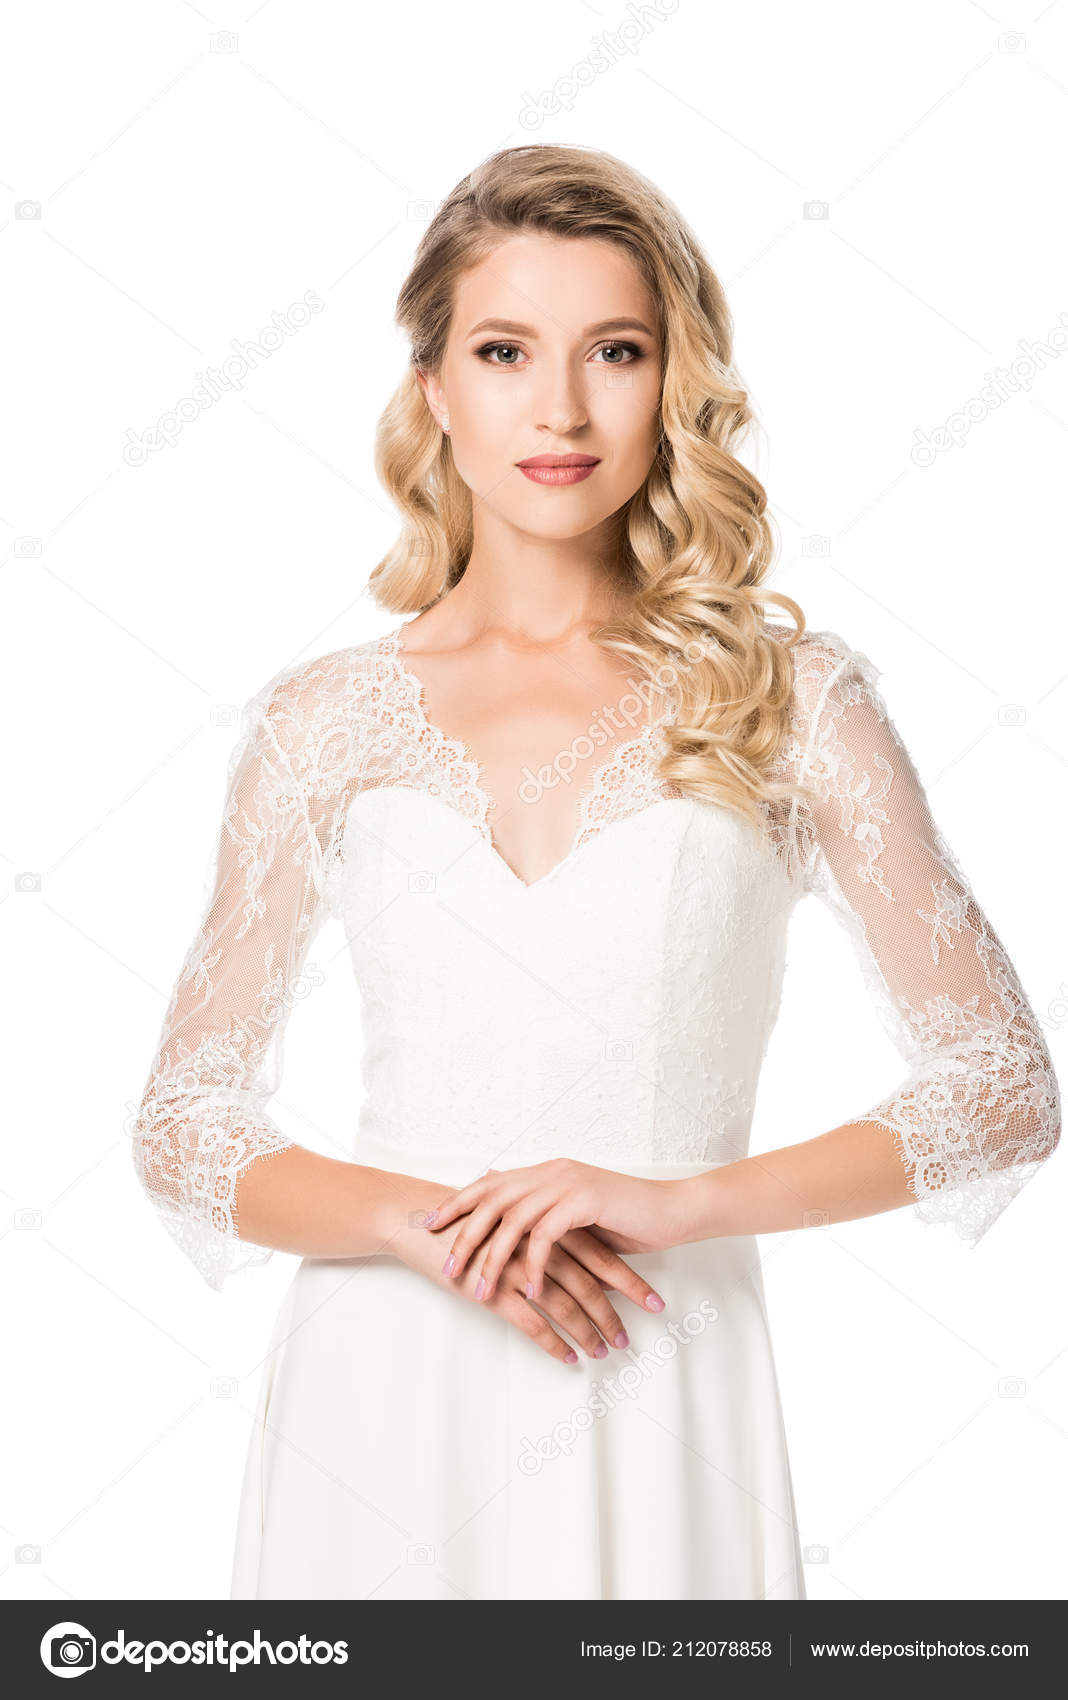 9481ba4d7e Close Πορτρέτο Του Νεαρή Νύφη Στο Γάμο Φόρεμα Βλέπουν Φωτογραφική– εικόνα  αρχείου